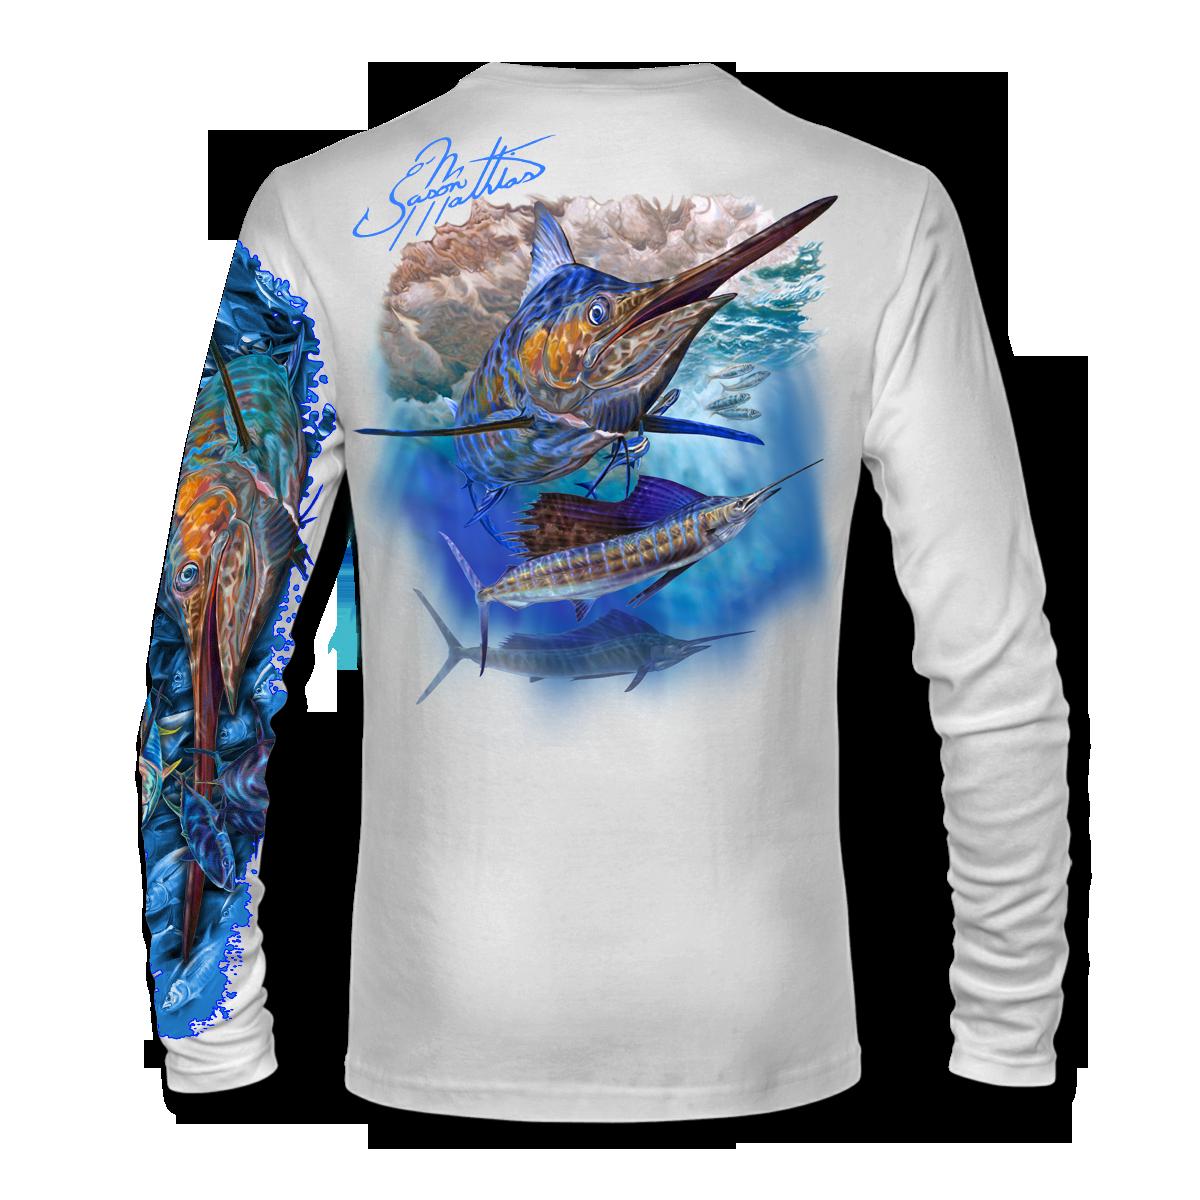 marlin-sailfish-white-shirt-jason-mathias-apparel-gear-fishing-gamefish-art-sportfish-art-tee-shirt-t-shirt-clothing.png